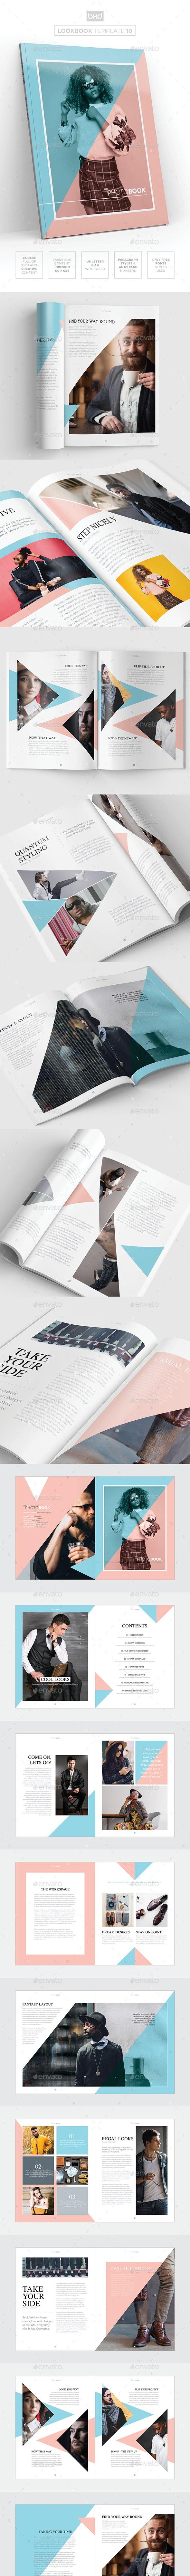 Magazine/Lookbook Template InDesign & Photoshop 10 - Magazines Print Templates